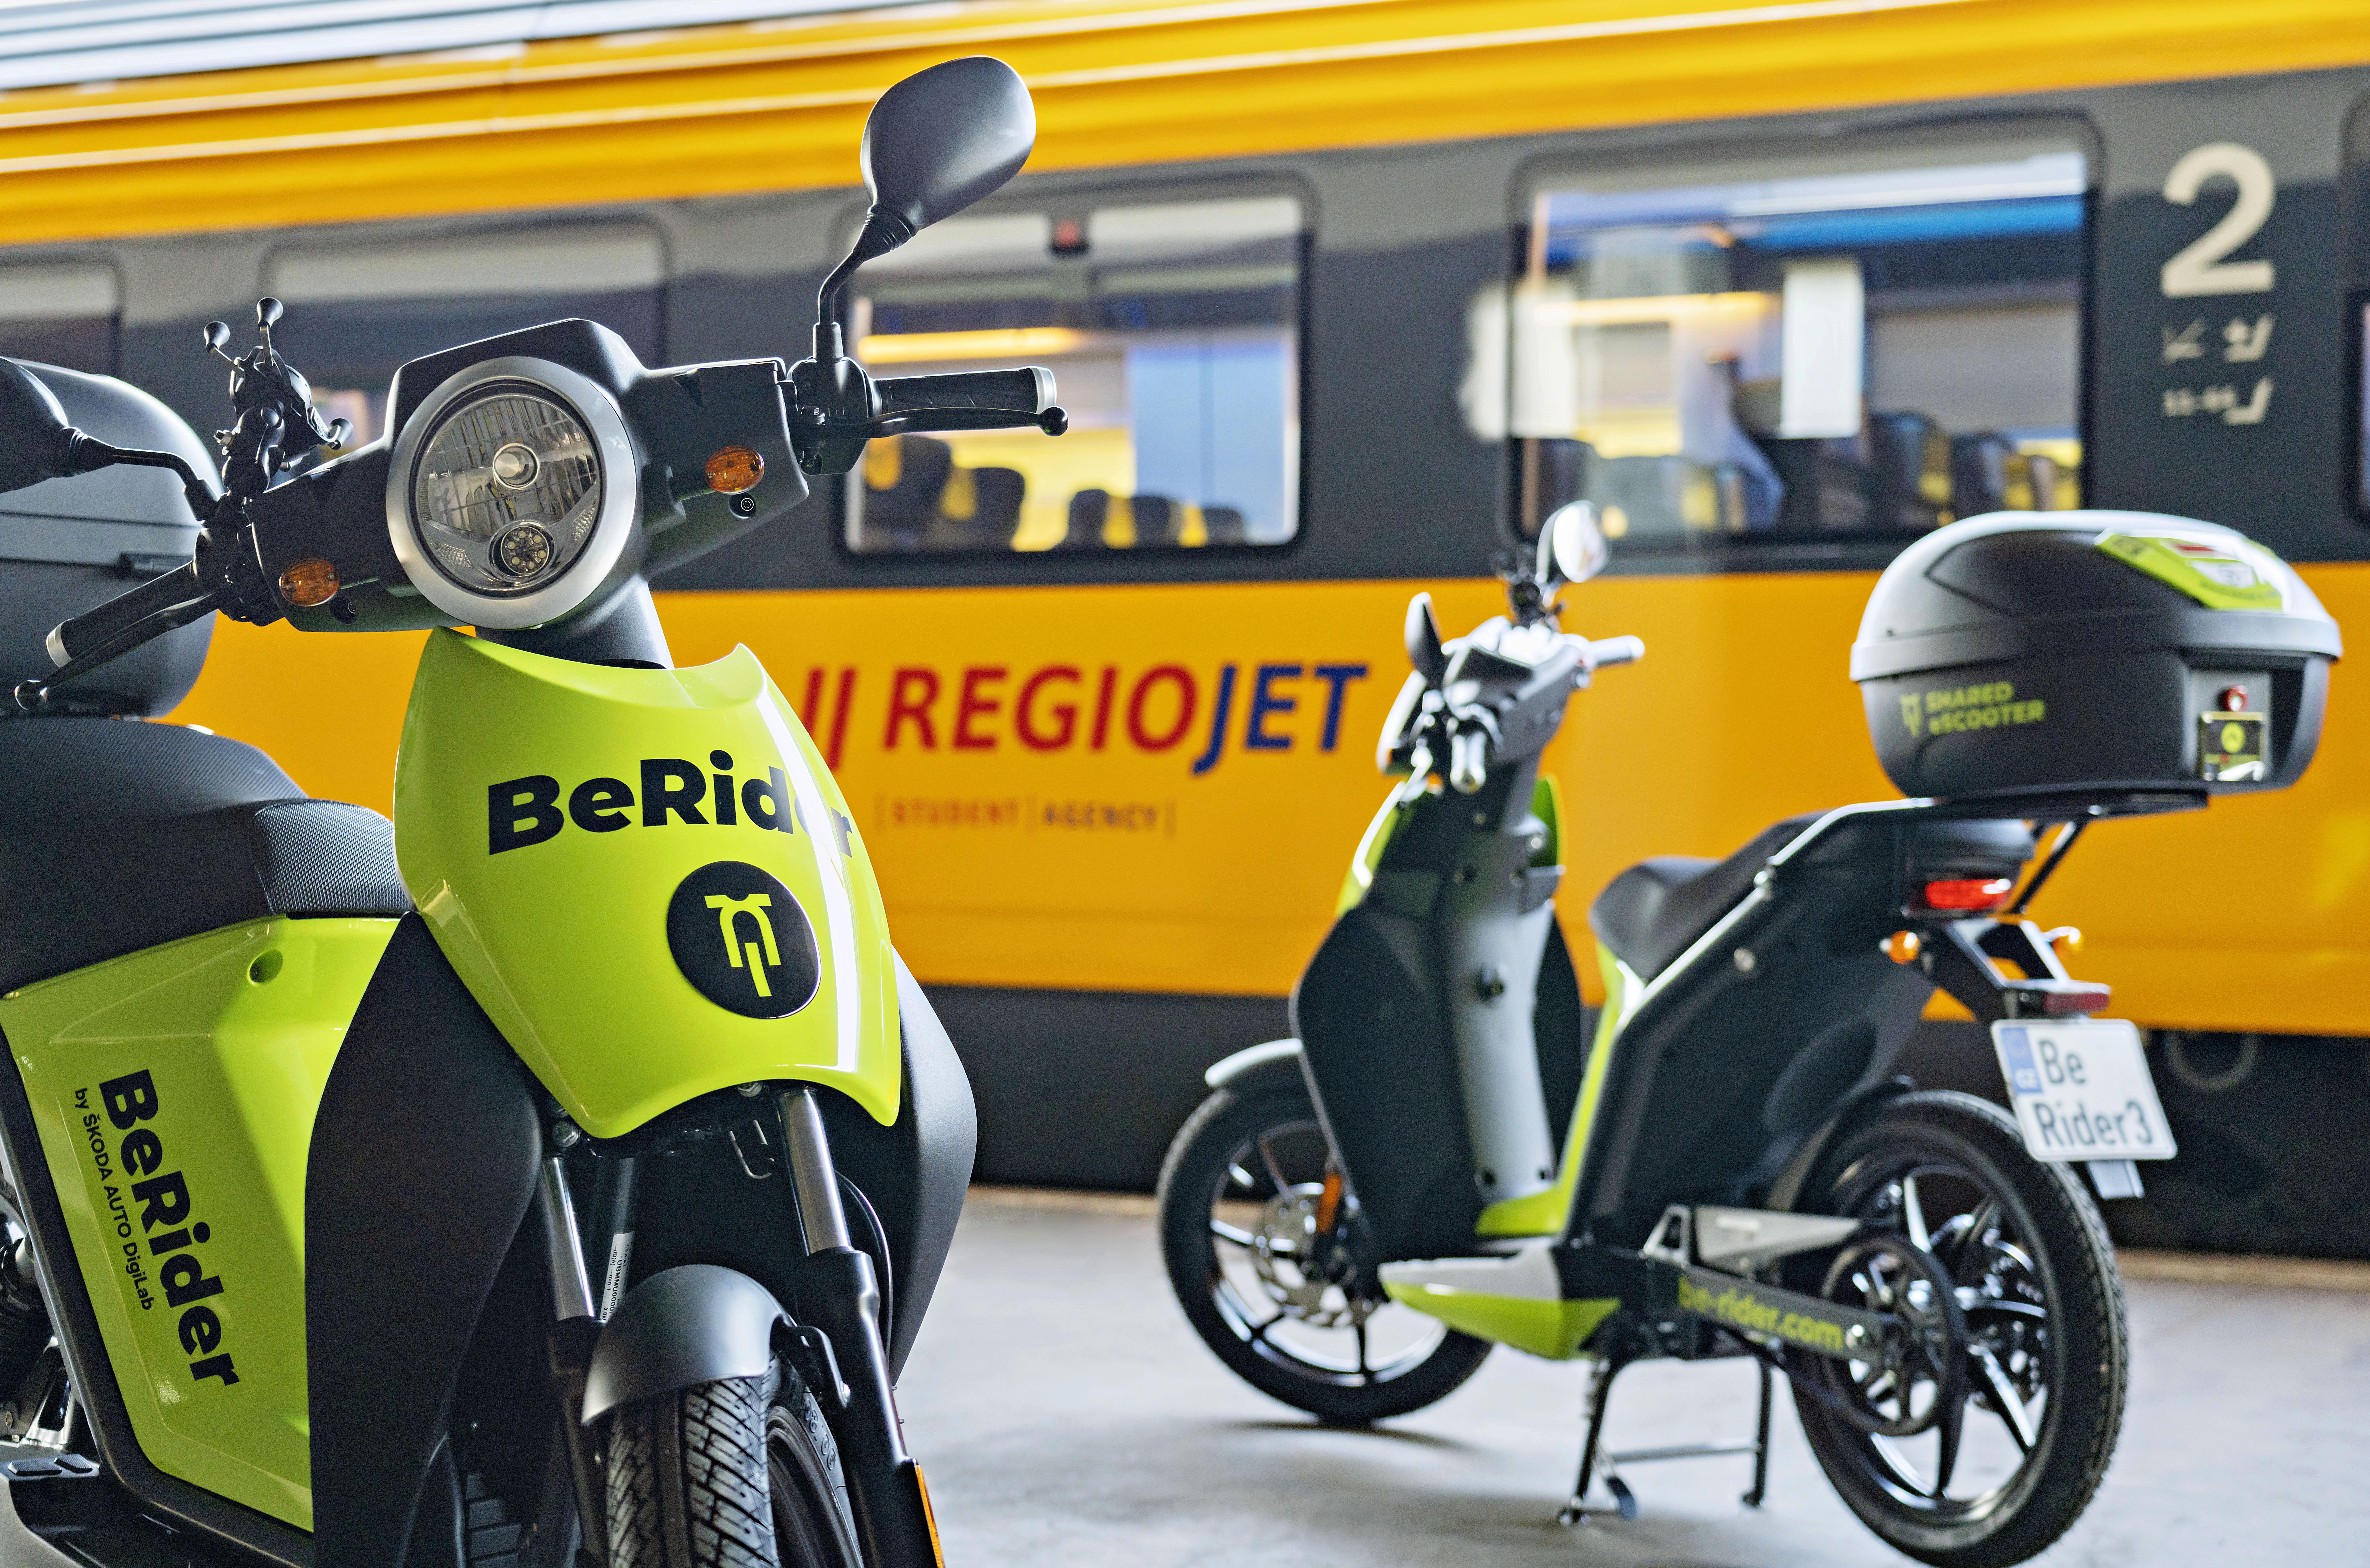 SKODA AUTO DigiLab and transport company RegioJet enter into all-embracing partnership - Image 1